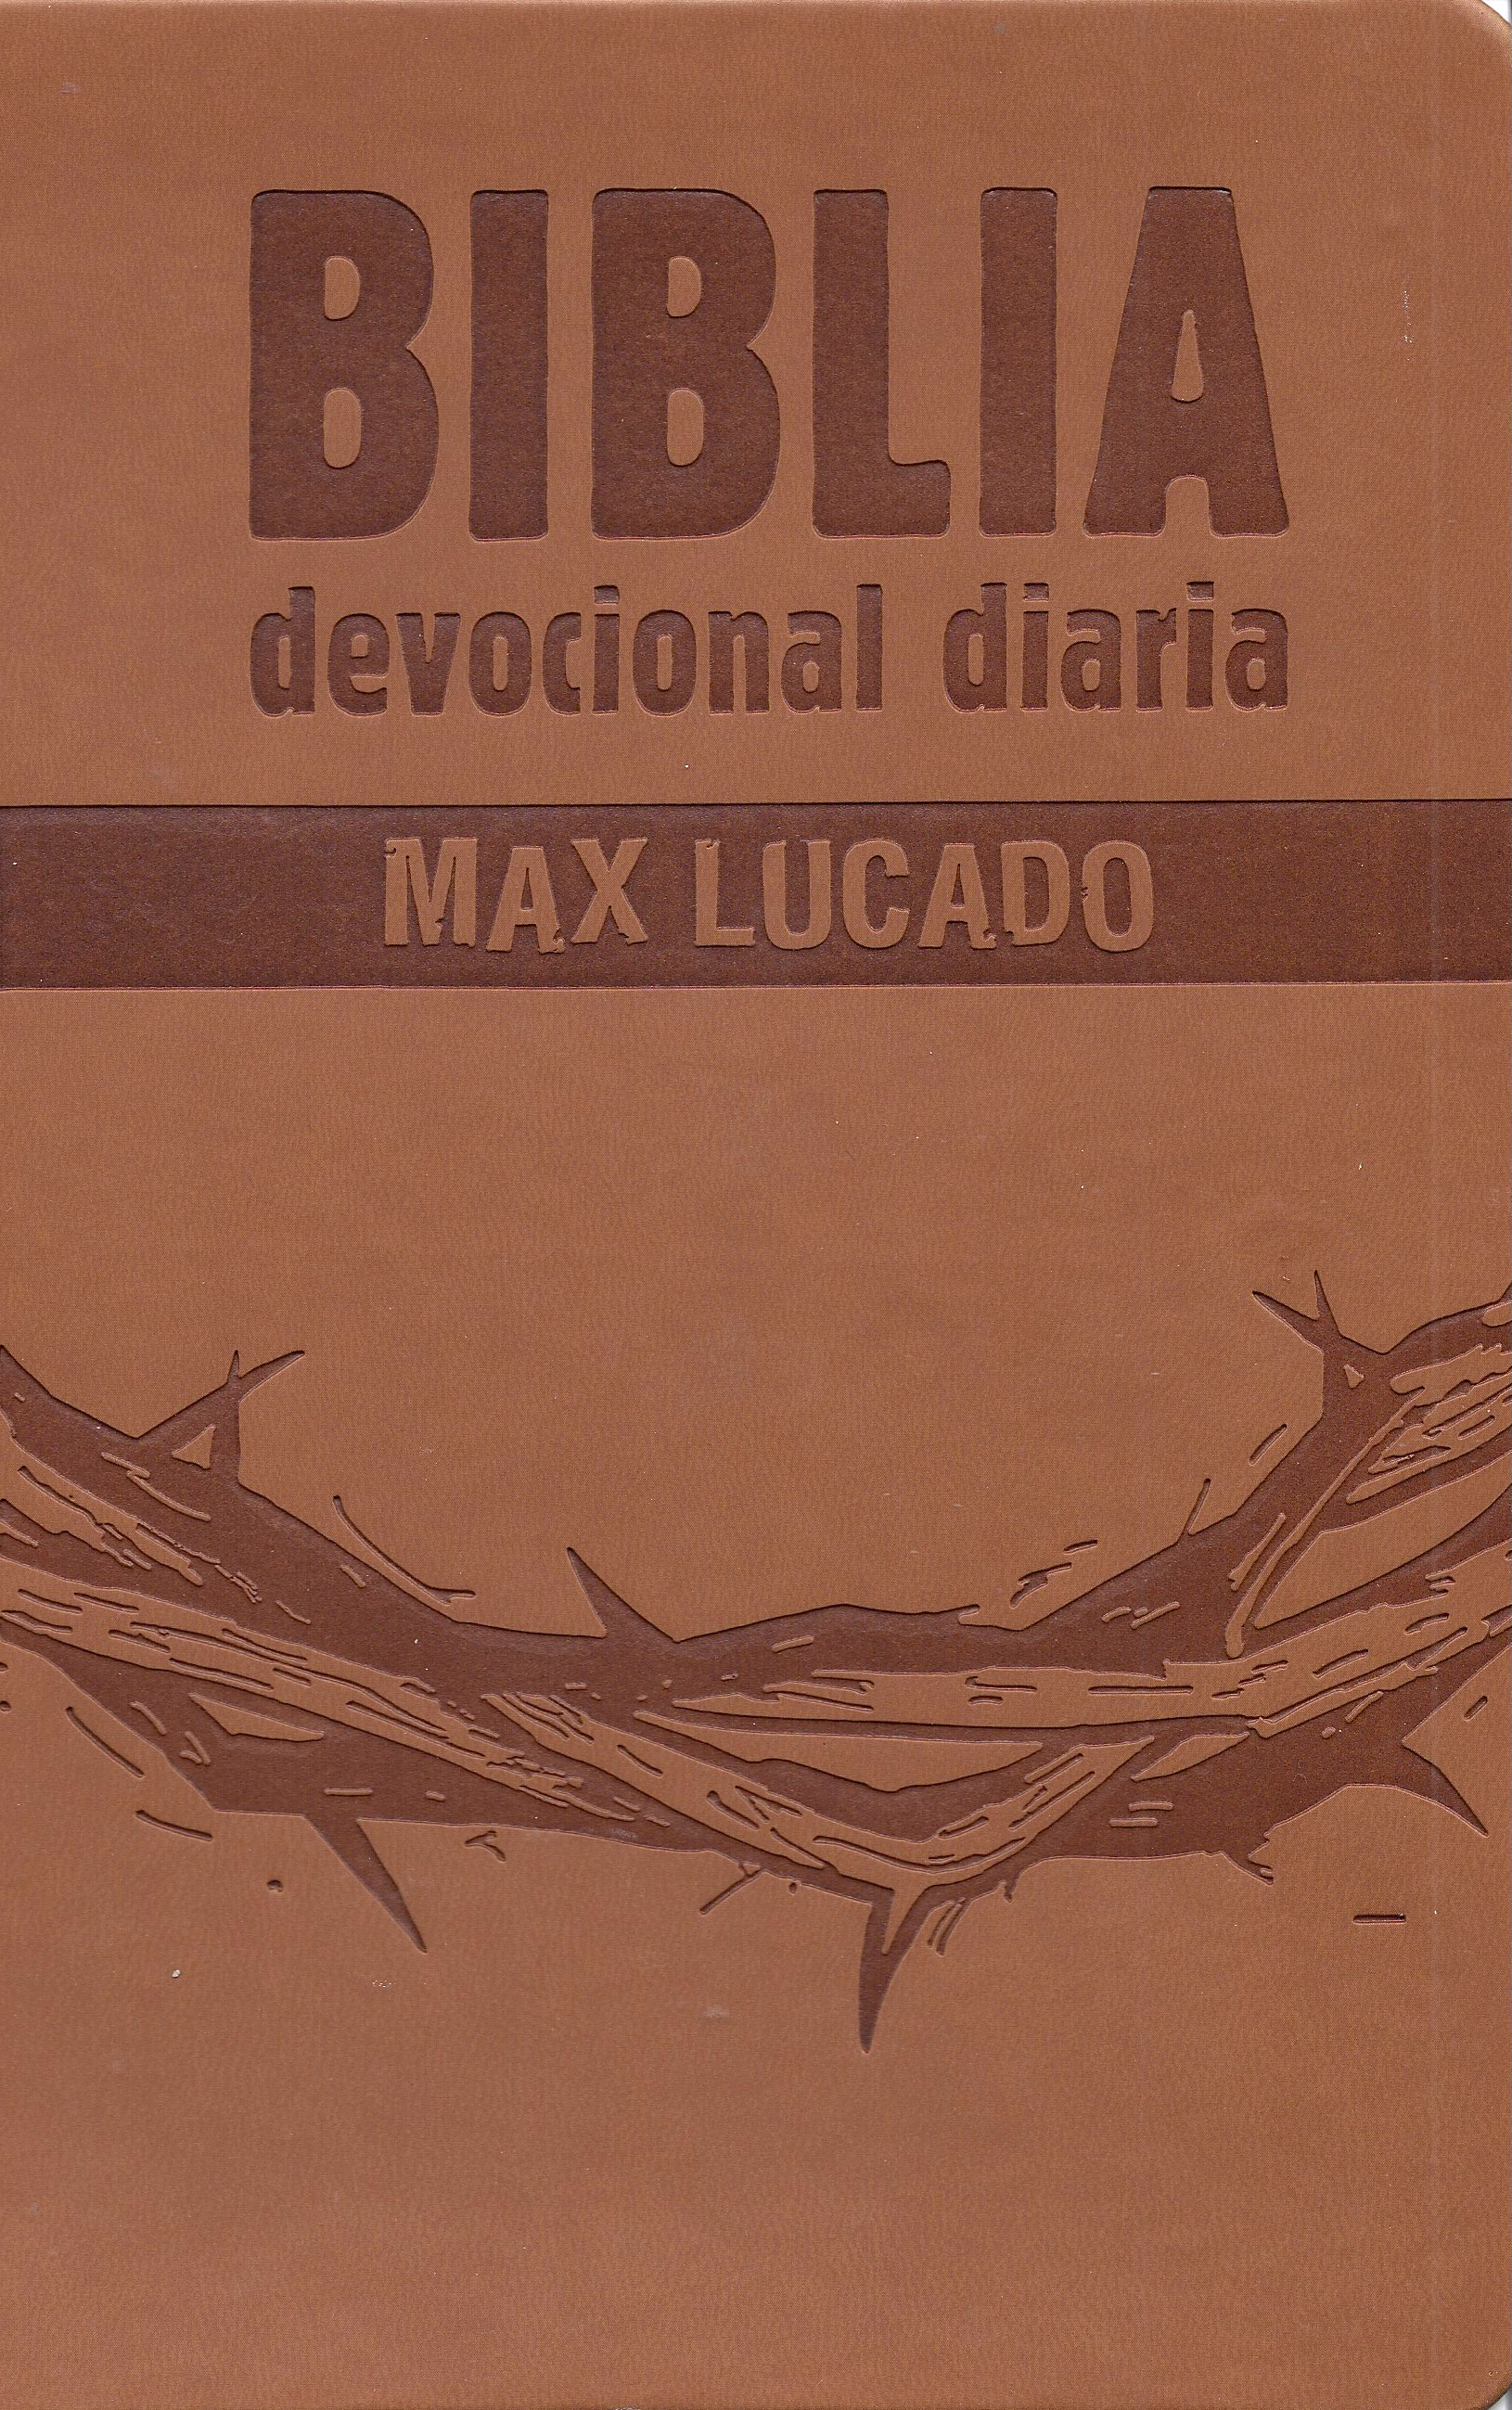 Biblia devocional diaria